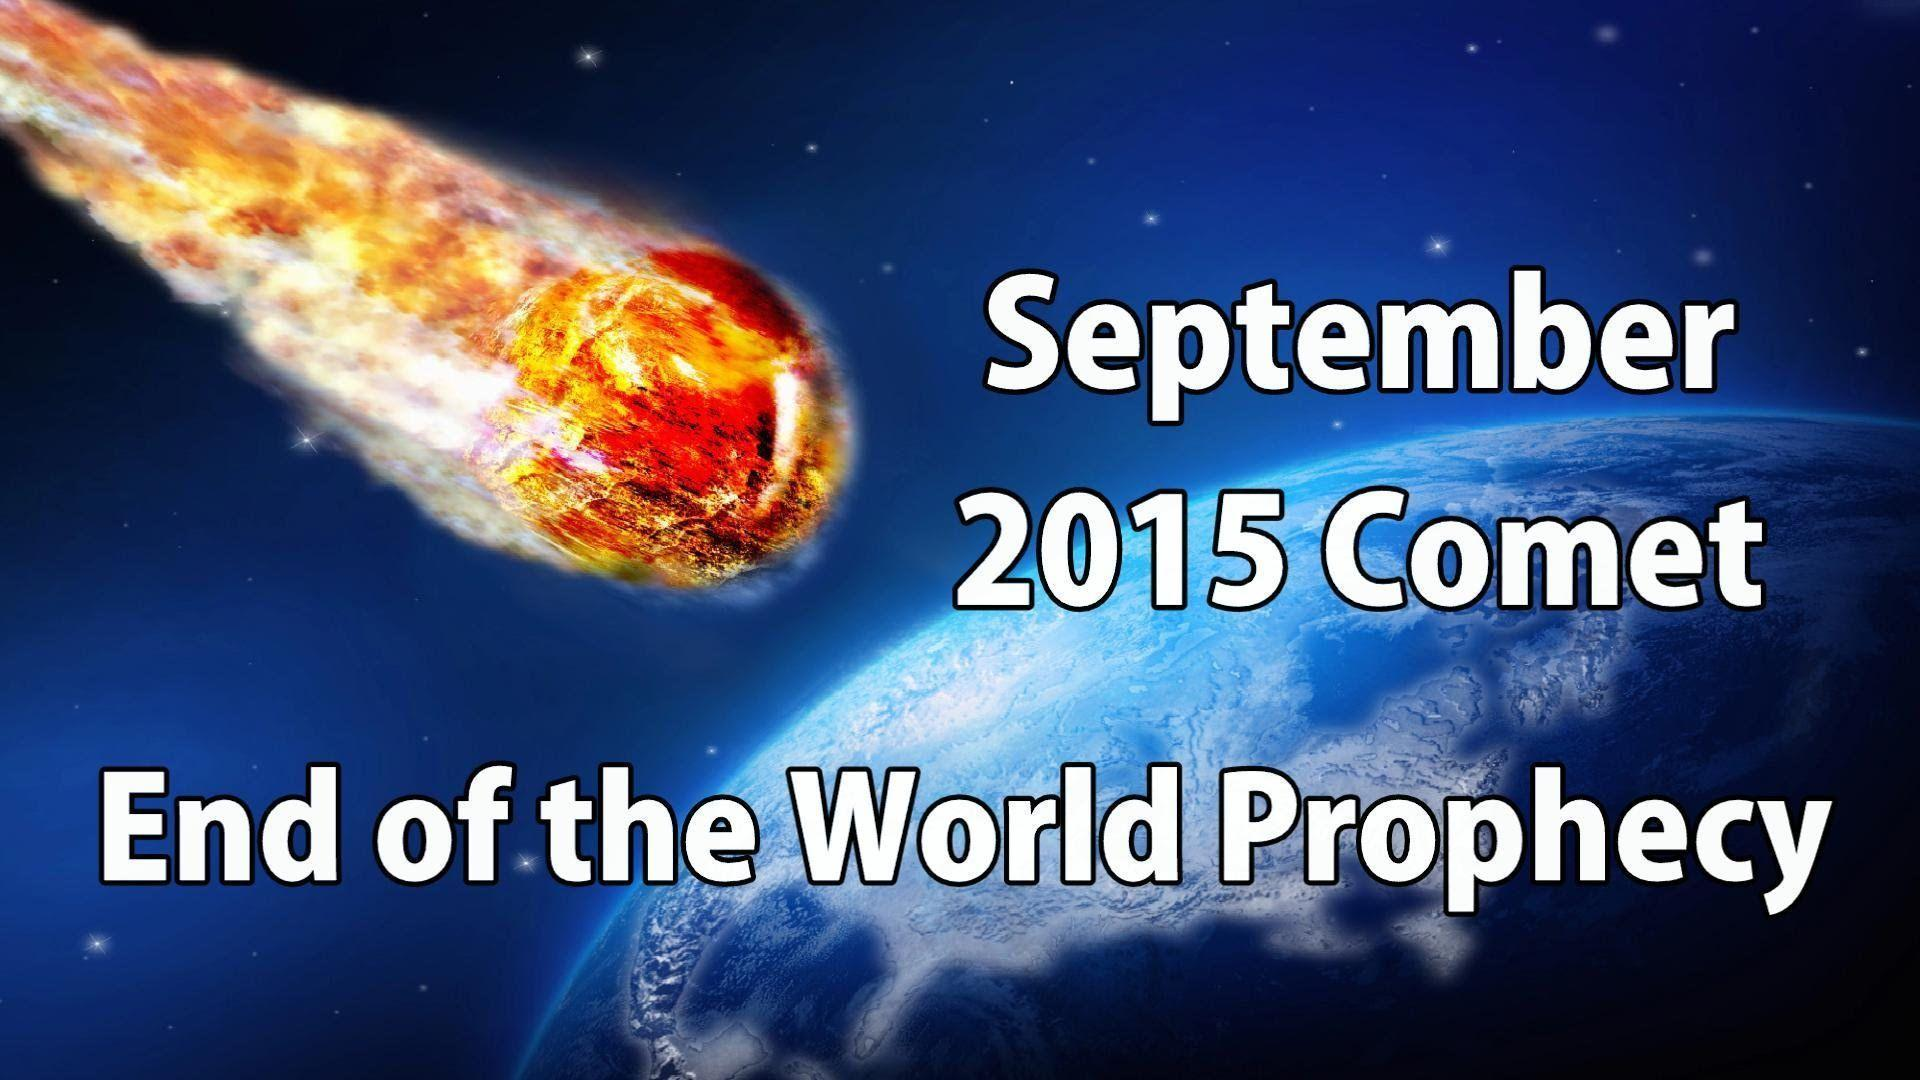 nasa comet september 2015 - HD1920×1080